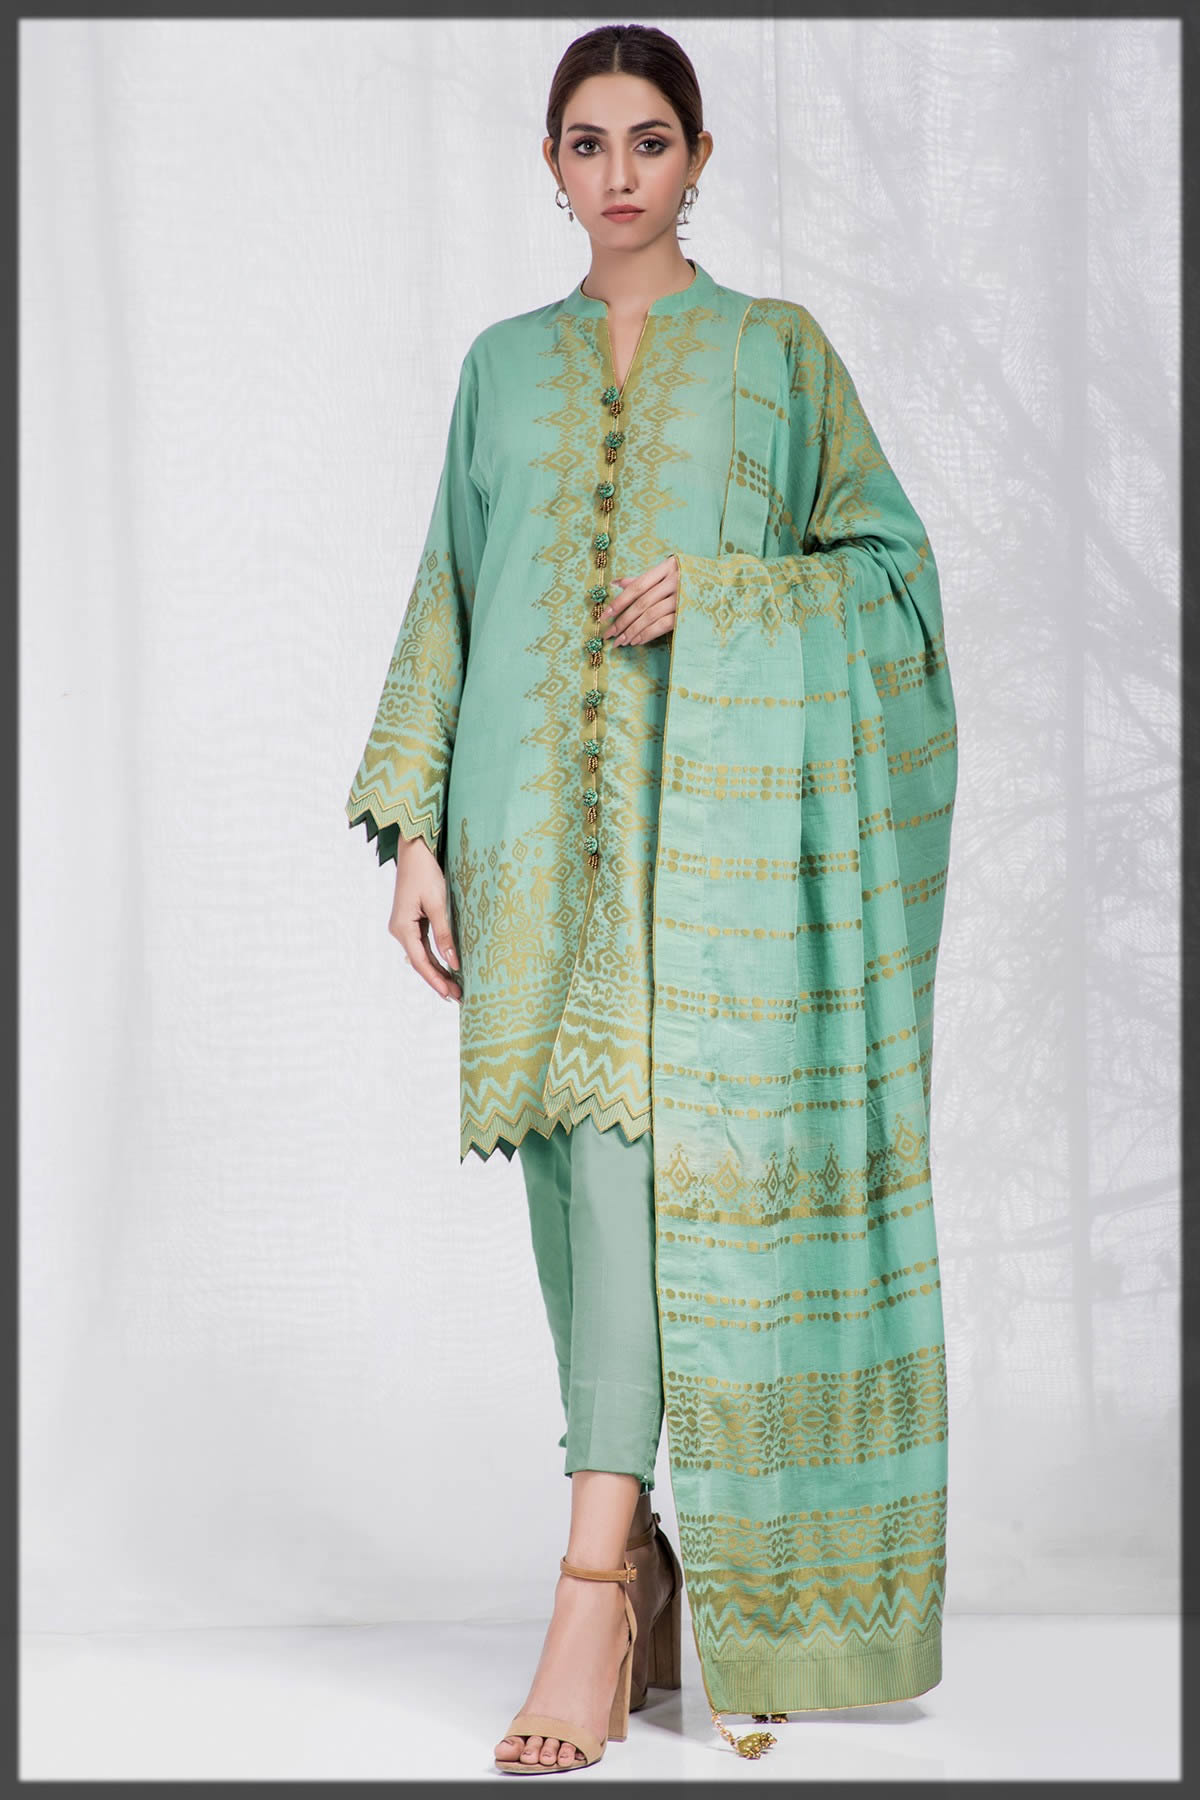 jacquard summer dress by alkaram studio